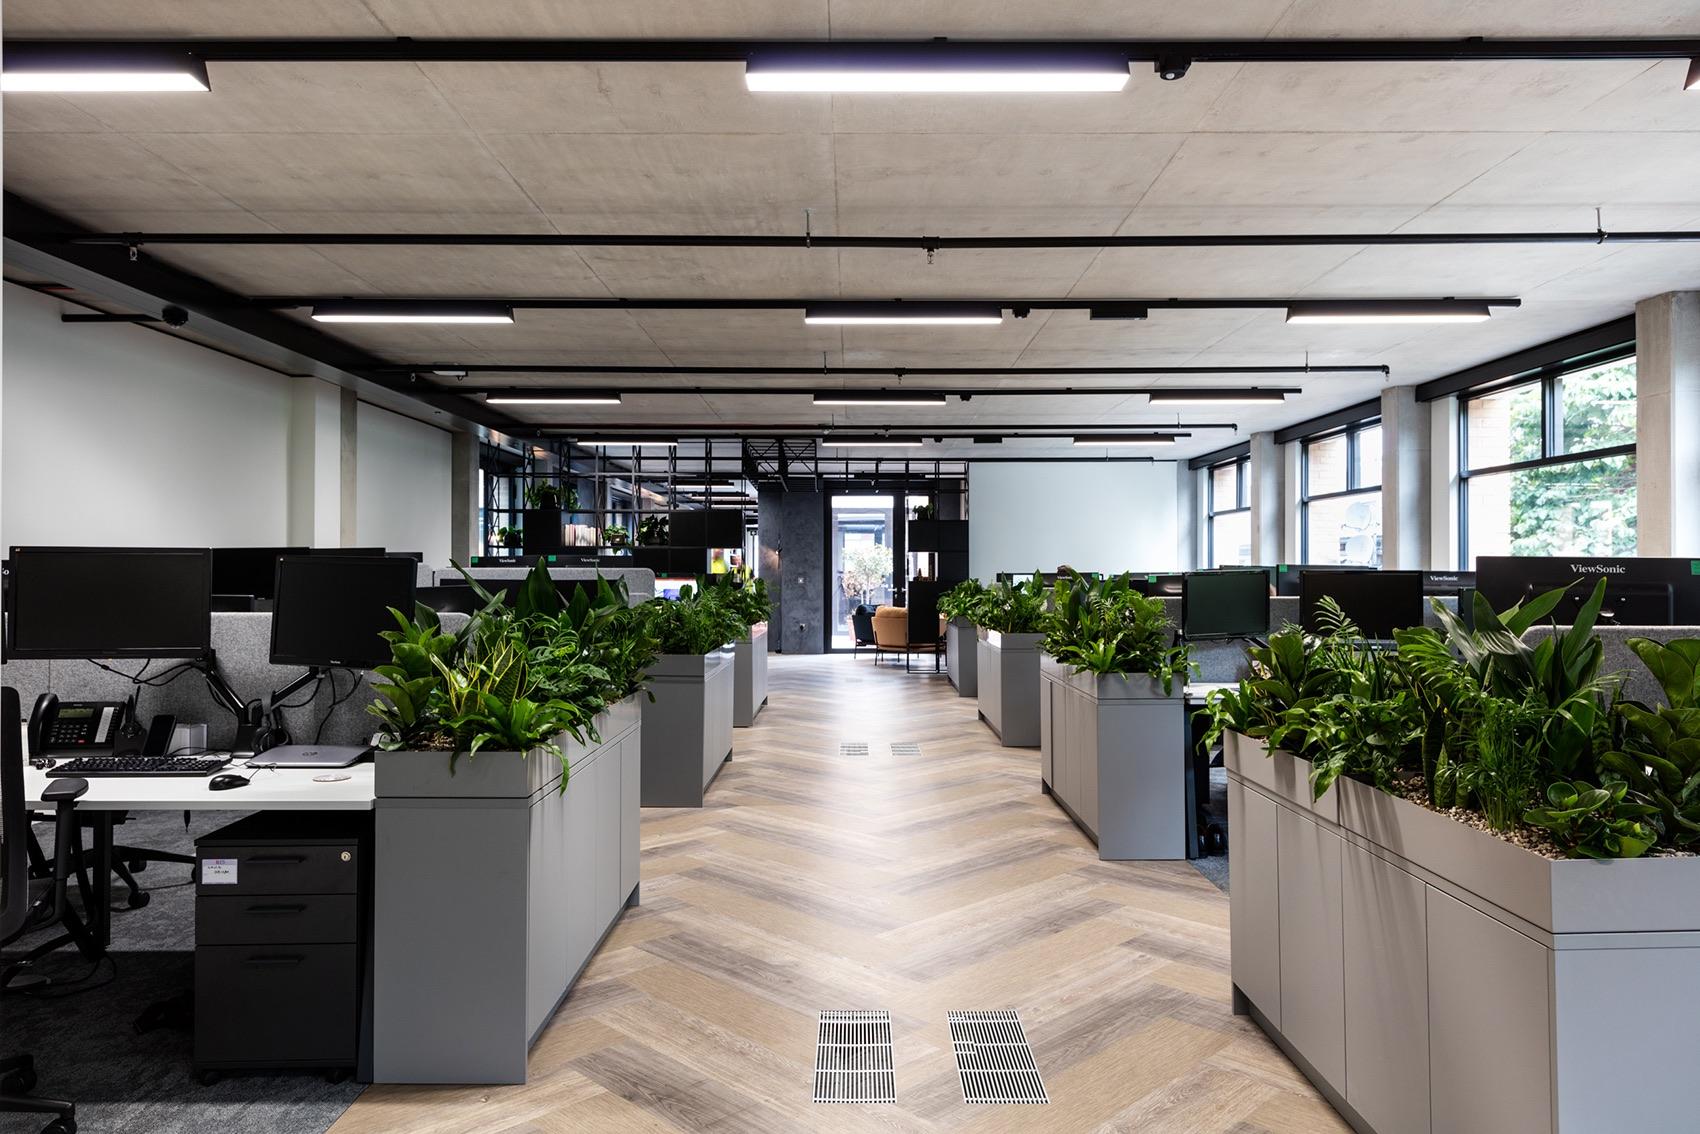 albion-capital-london-office-9